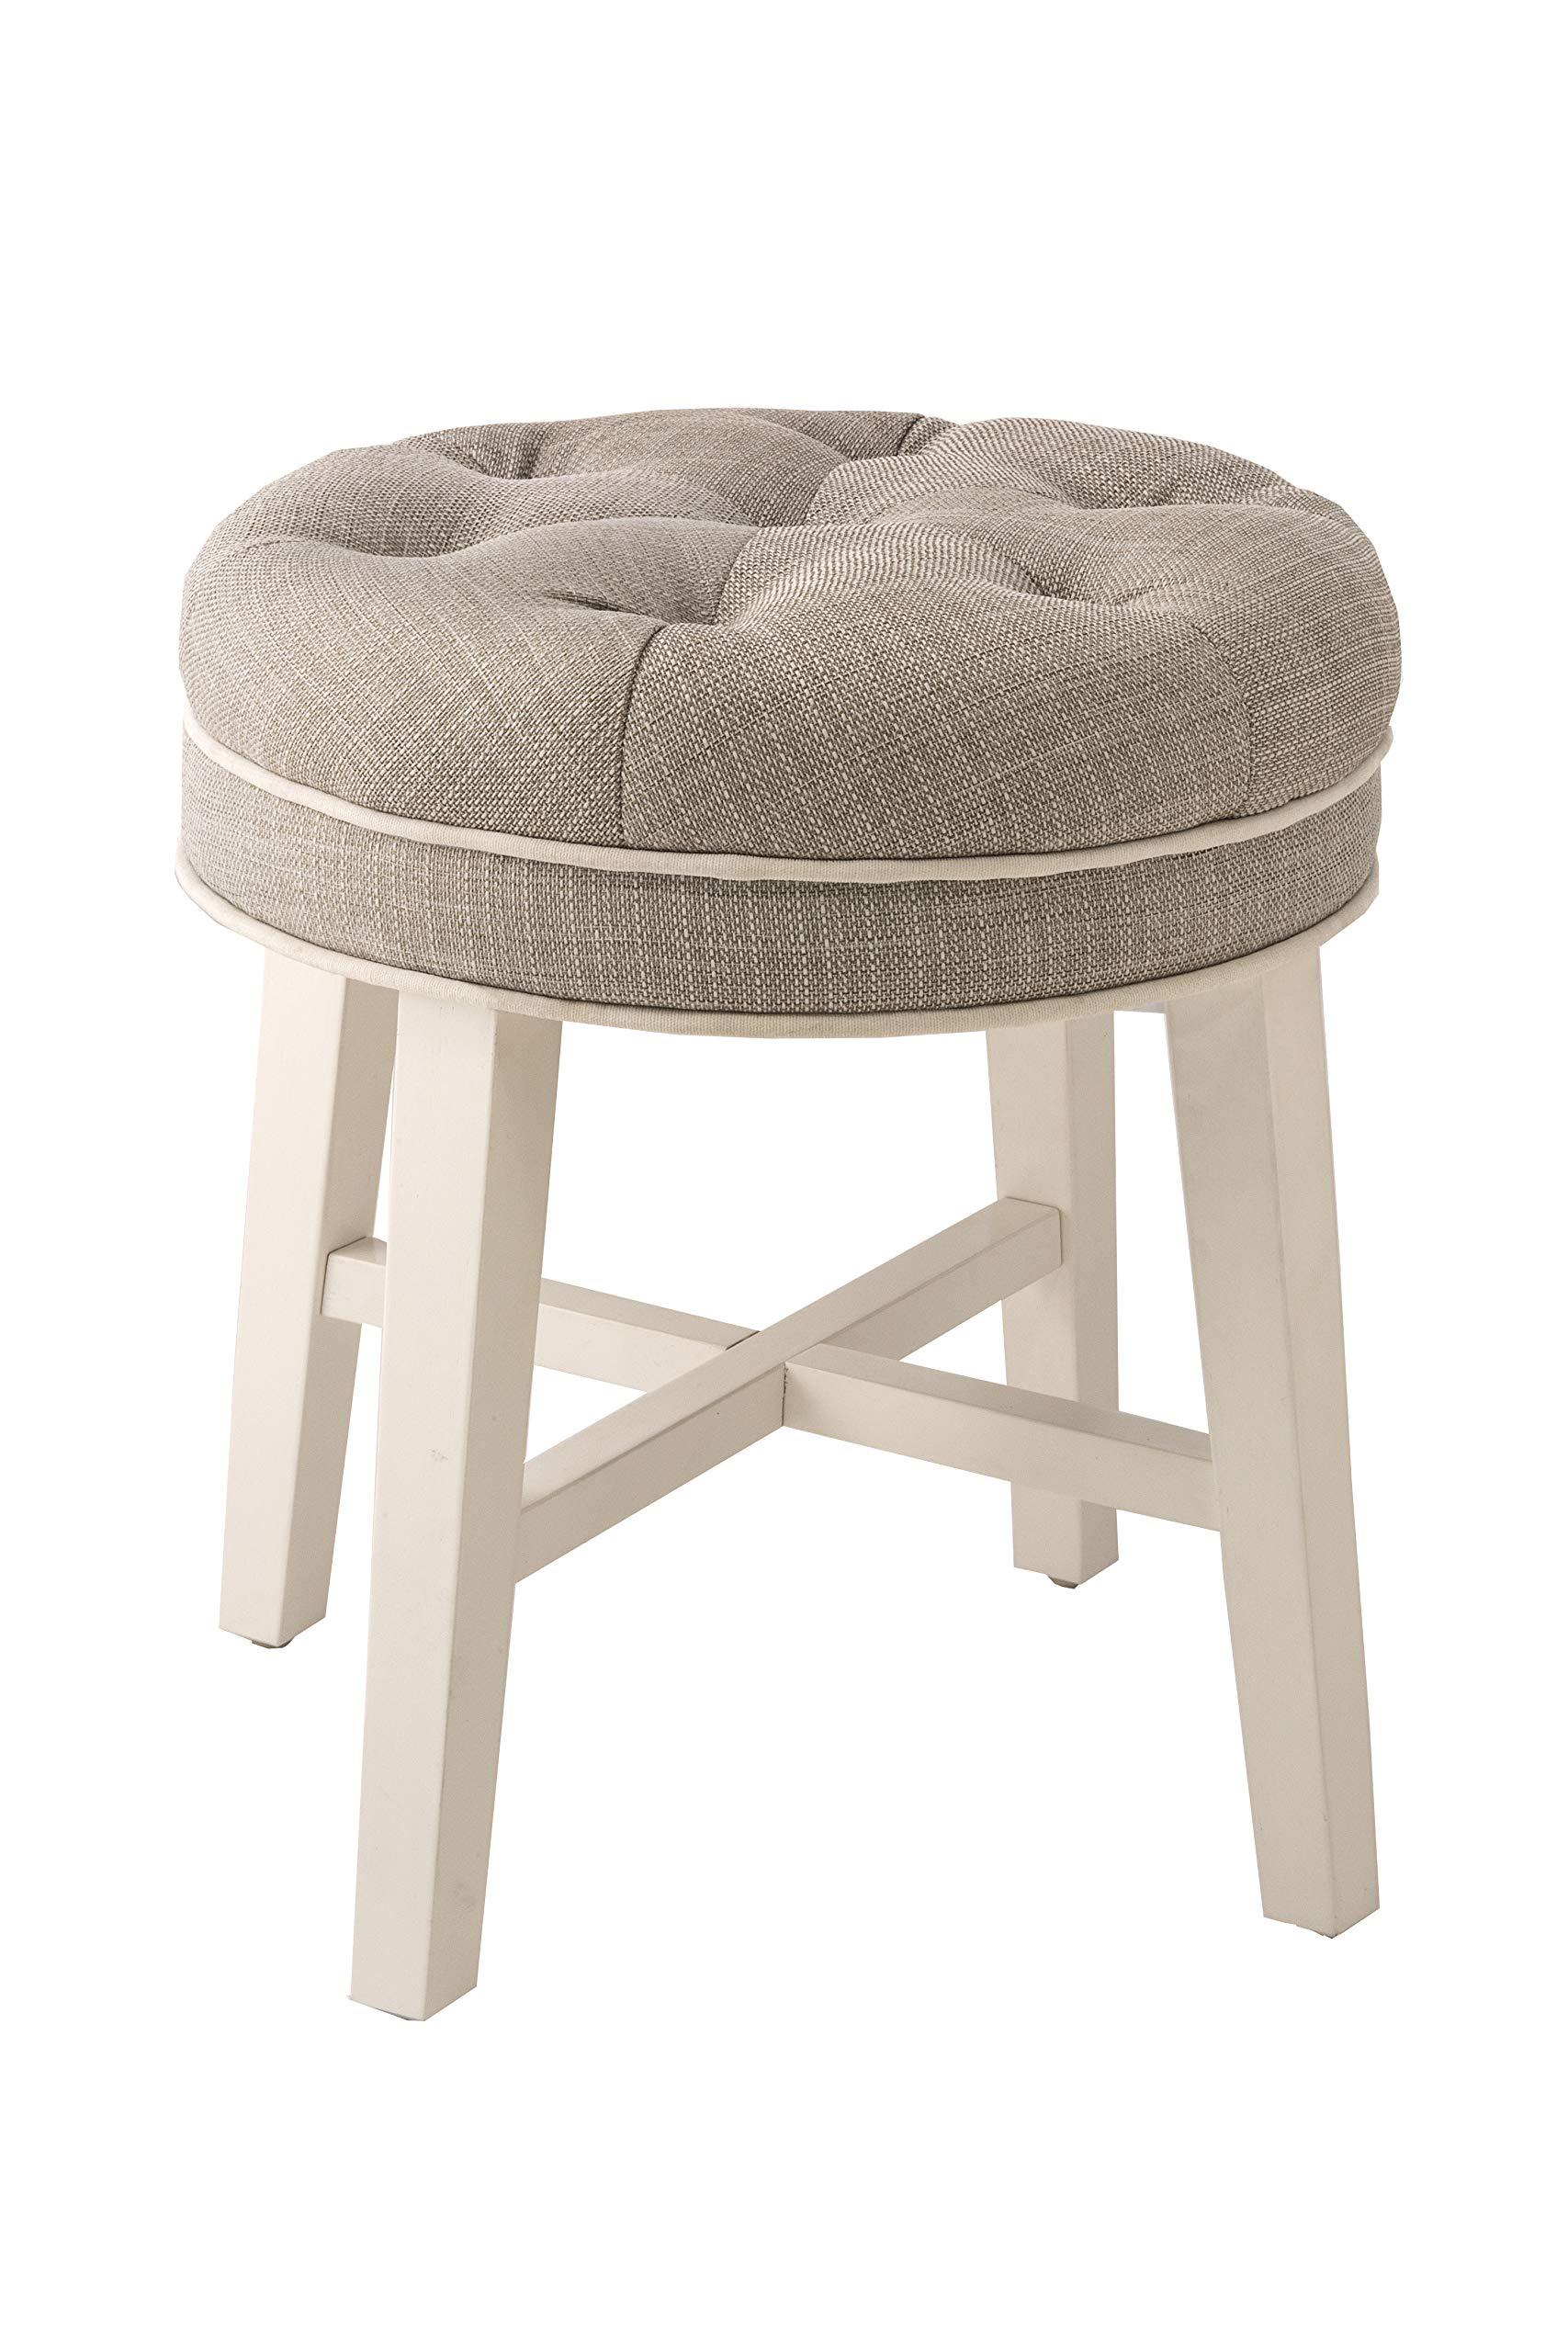 Hillsdale Furniture 51007 Sophia Vanity Stool, Linen Gray by Hillsdale Furniture